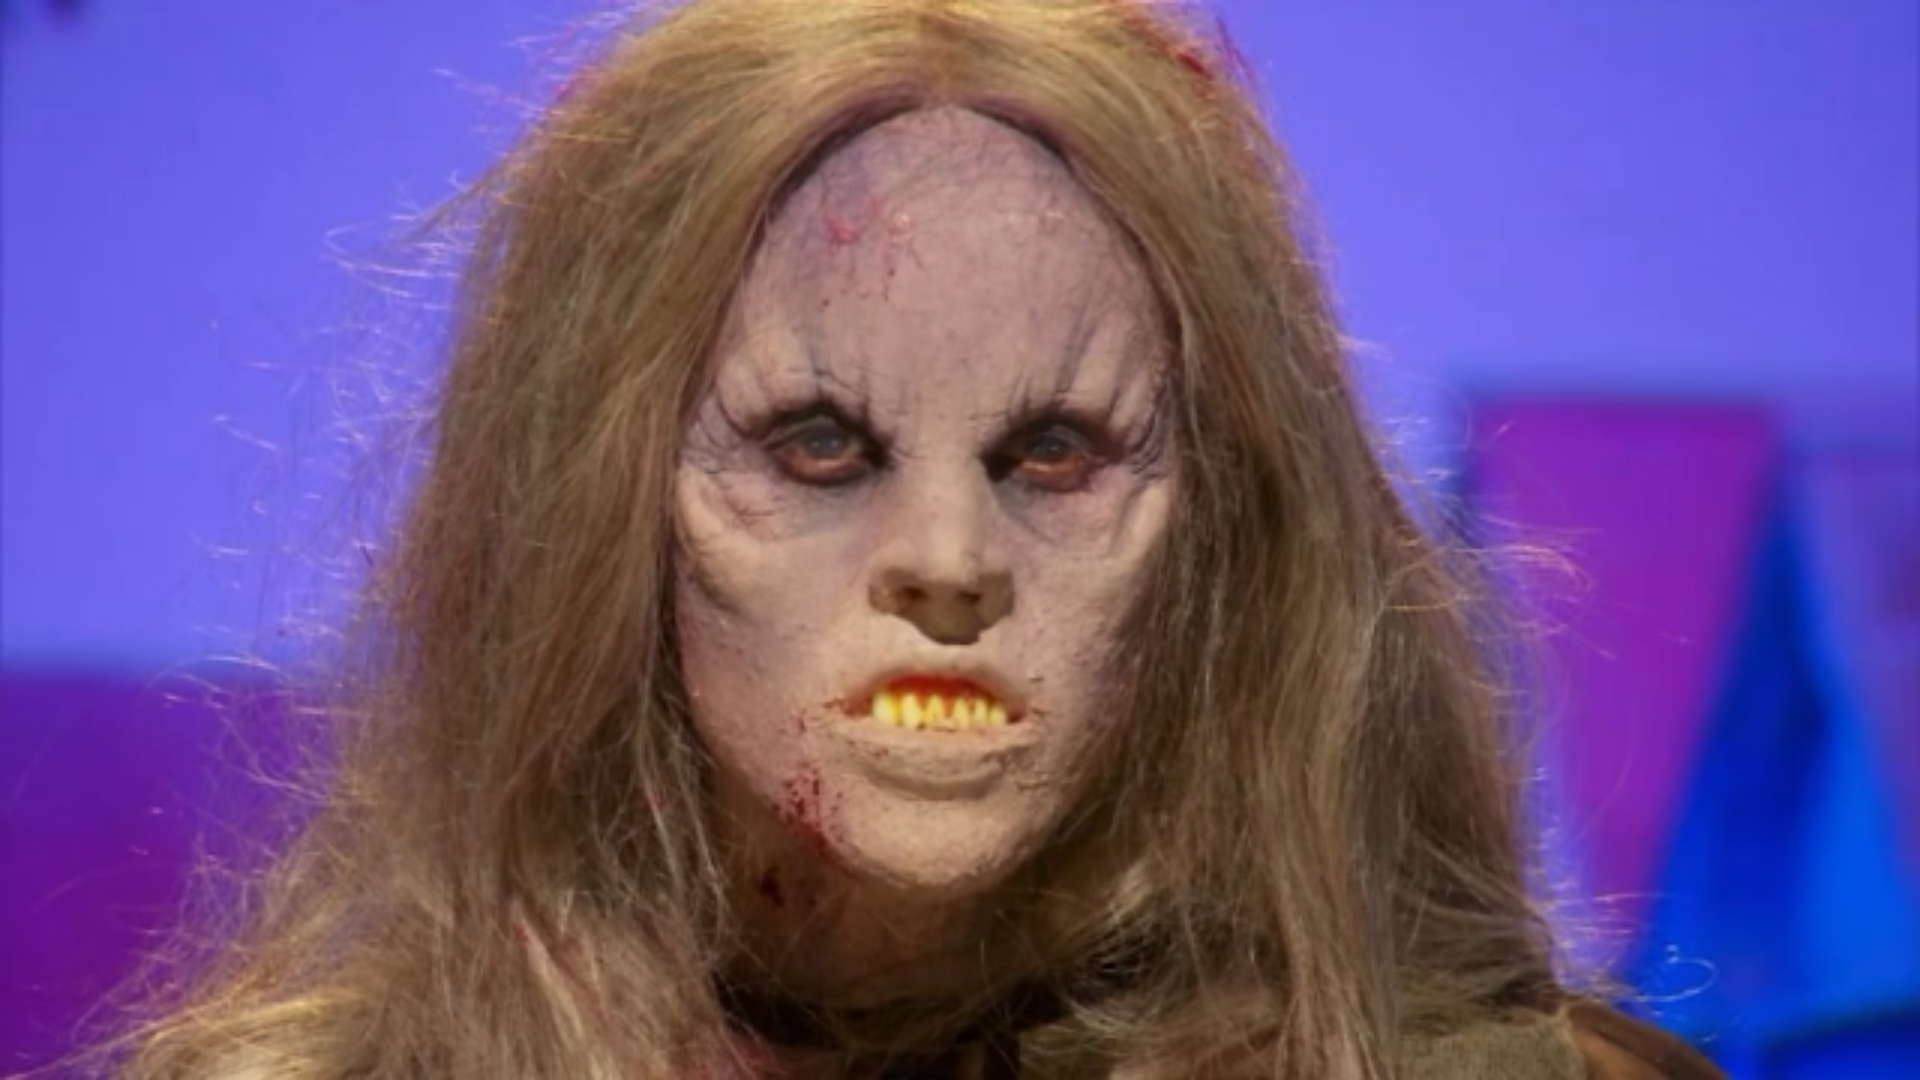 A close look at Meg Wilbur's finished makeup